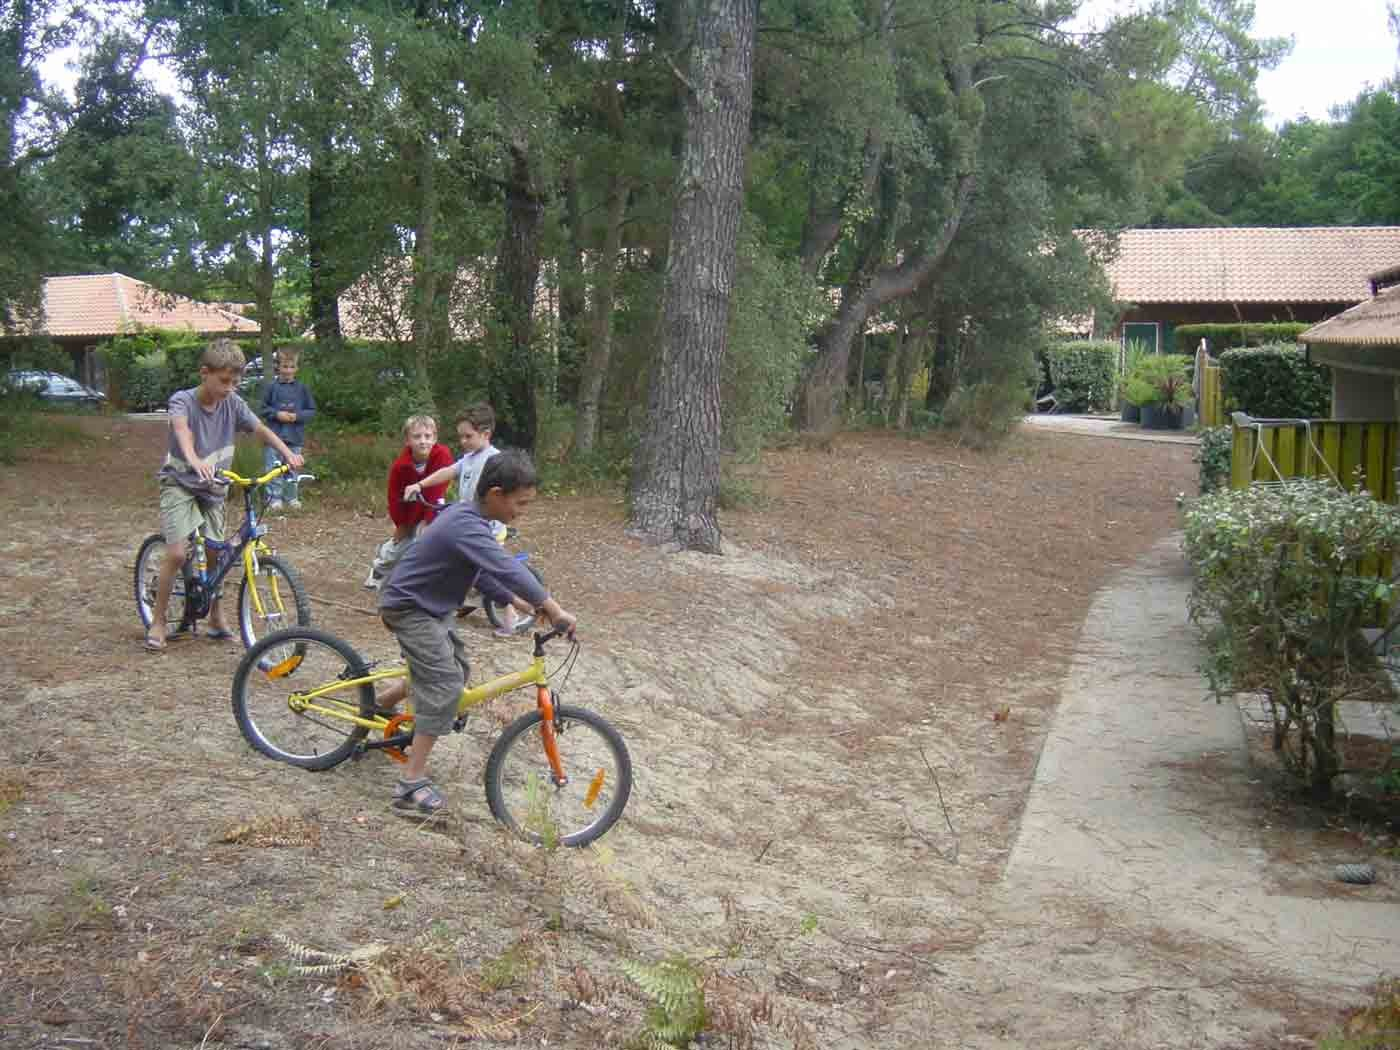 LOCATION VACANCES FAMILLE LANDES PISTE CYCLABLE